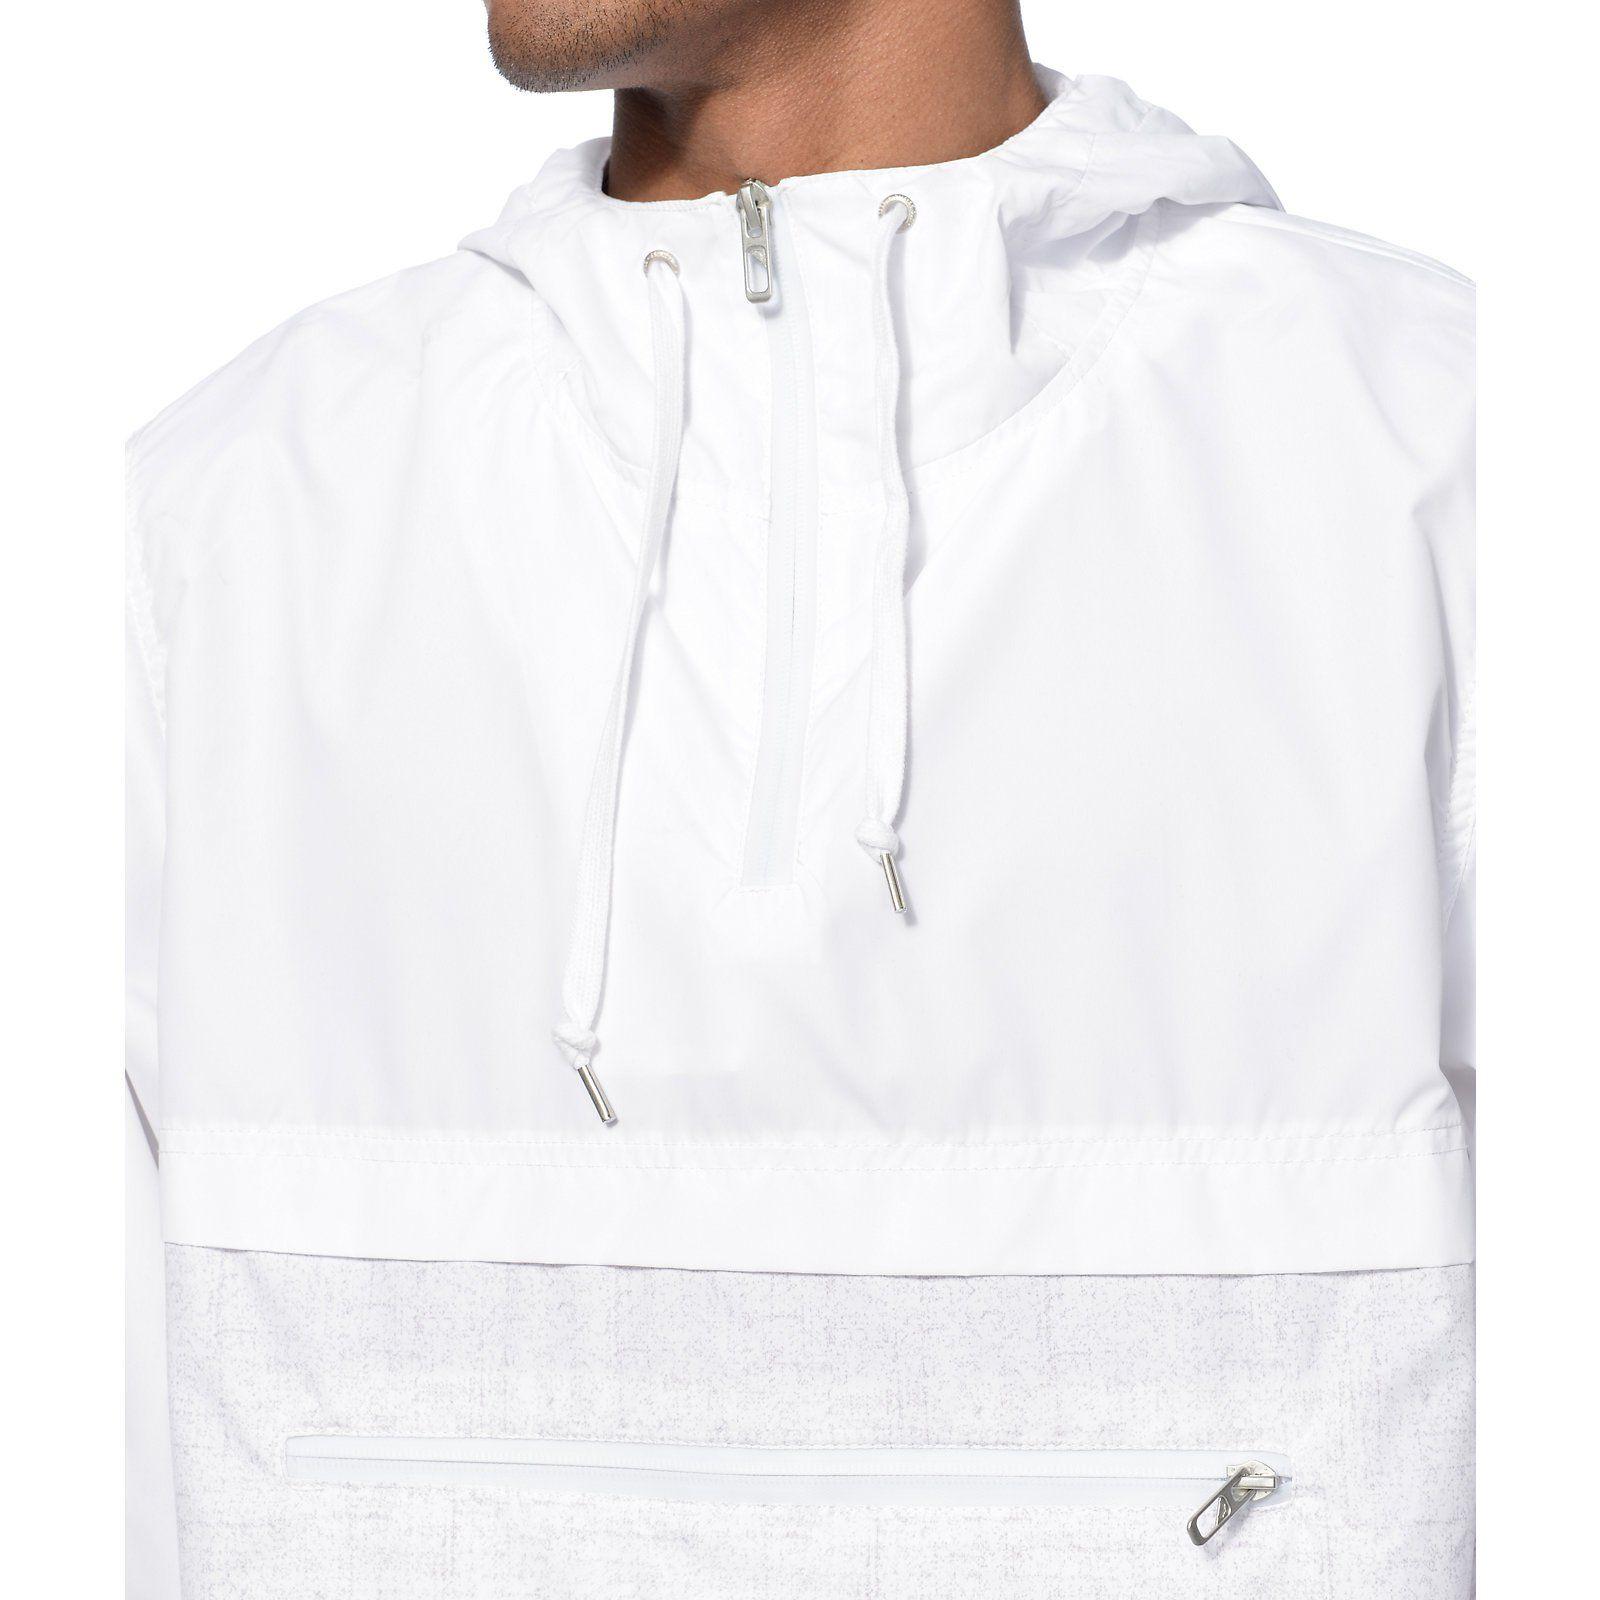 a77686e38 Empyre Transparent White Anorak Jacket   Style   Anorak jacket ...